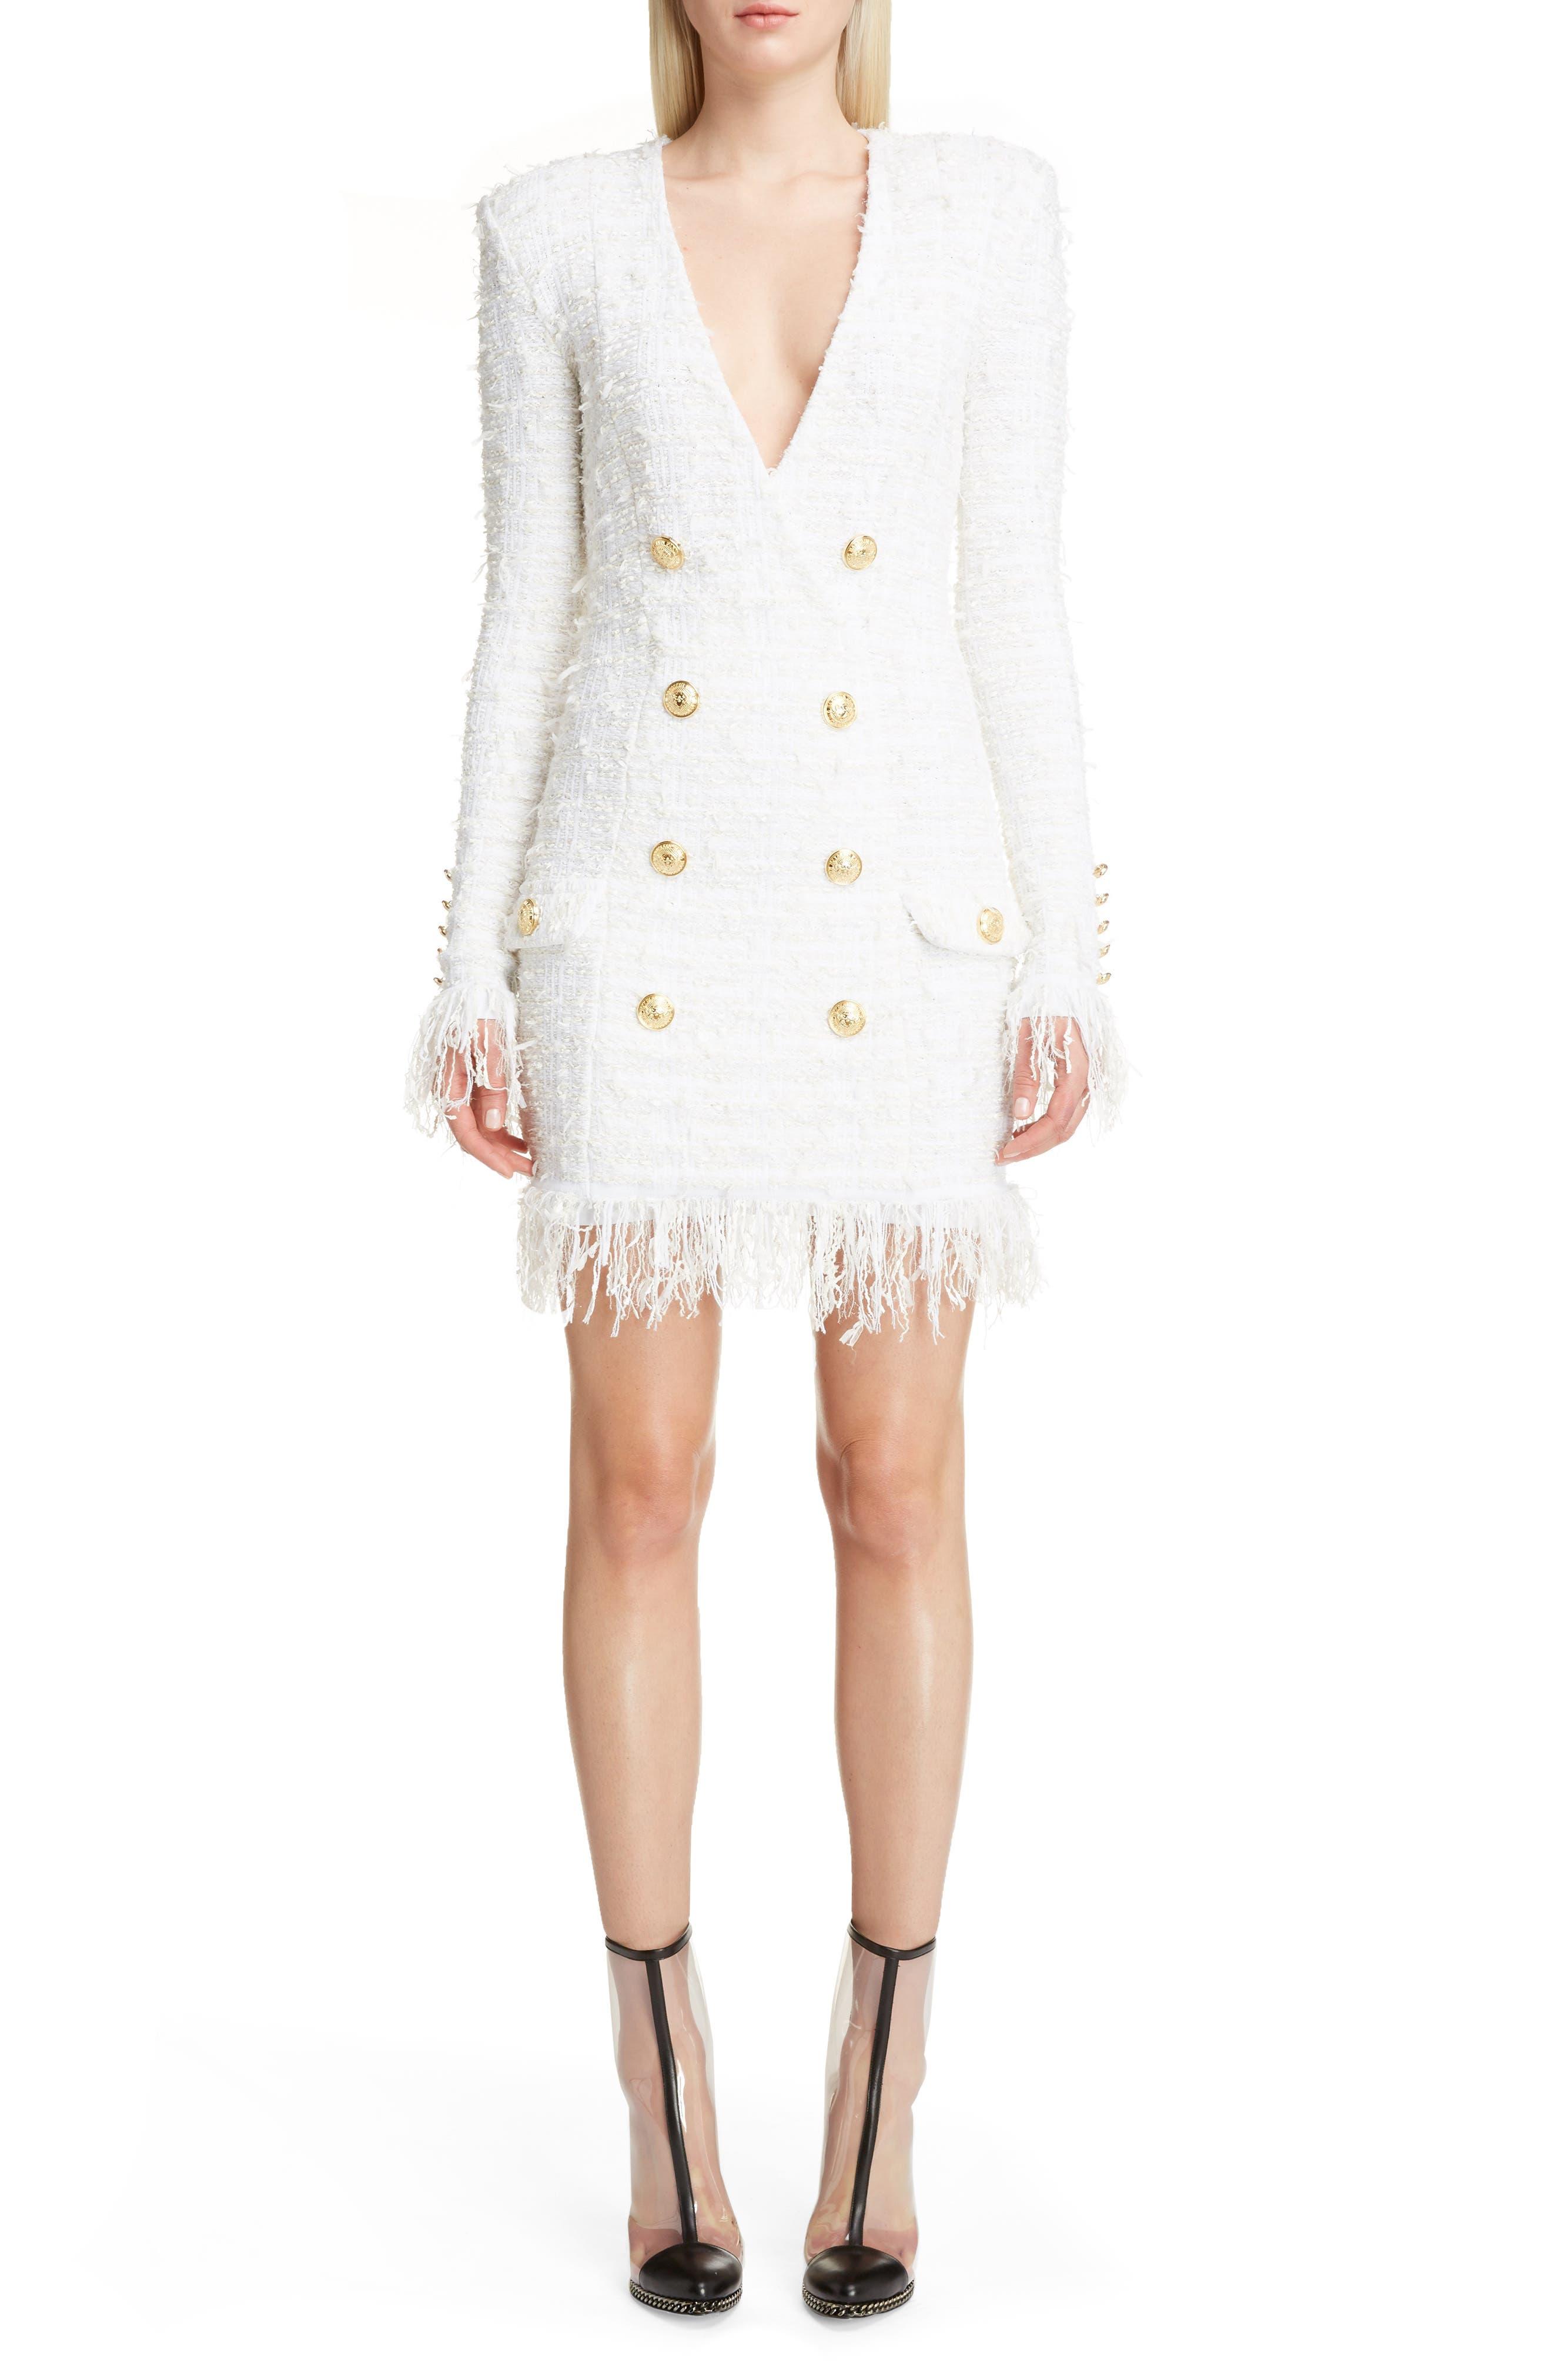 Balmain Fringe Tweed Dress